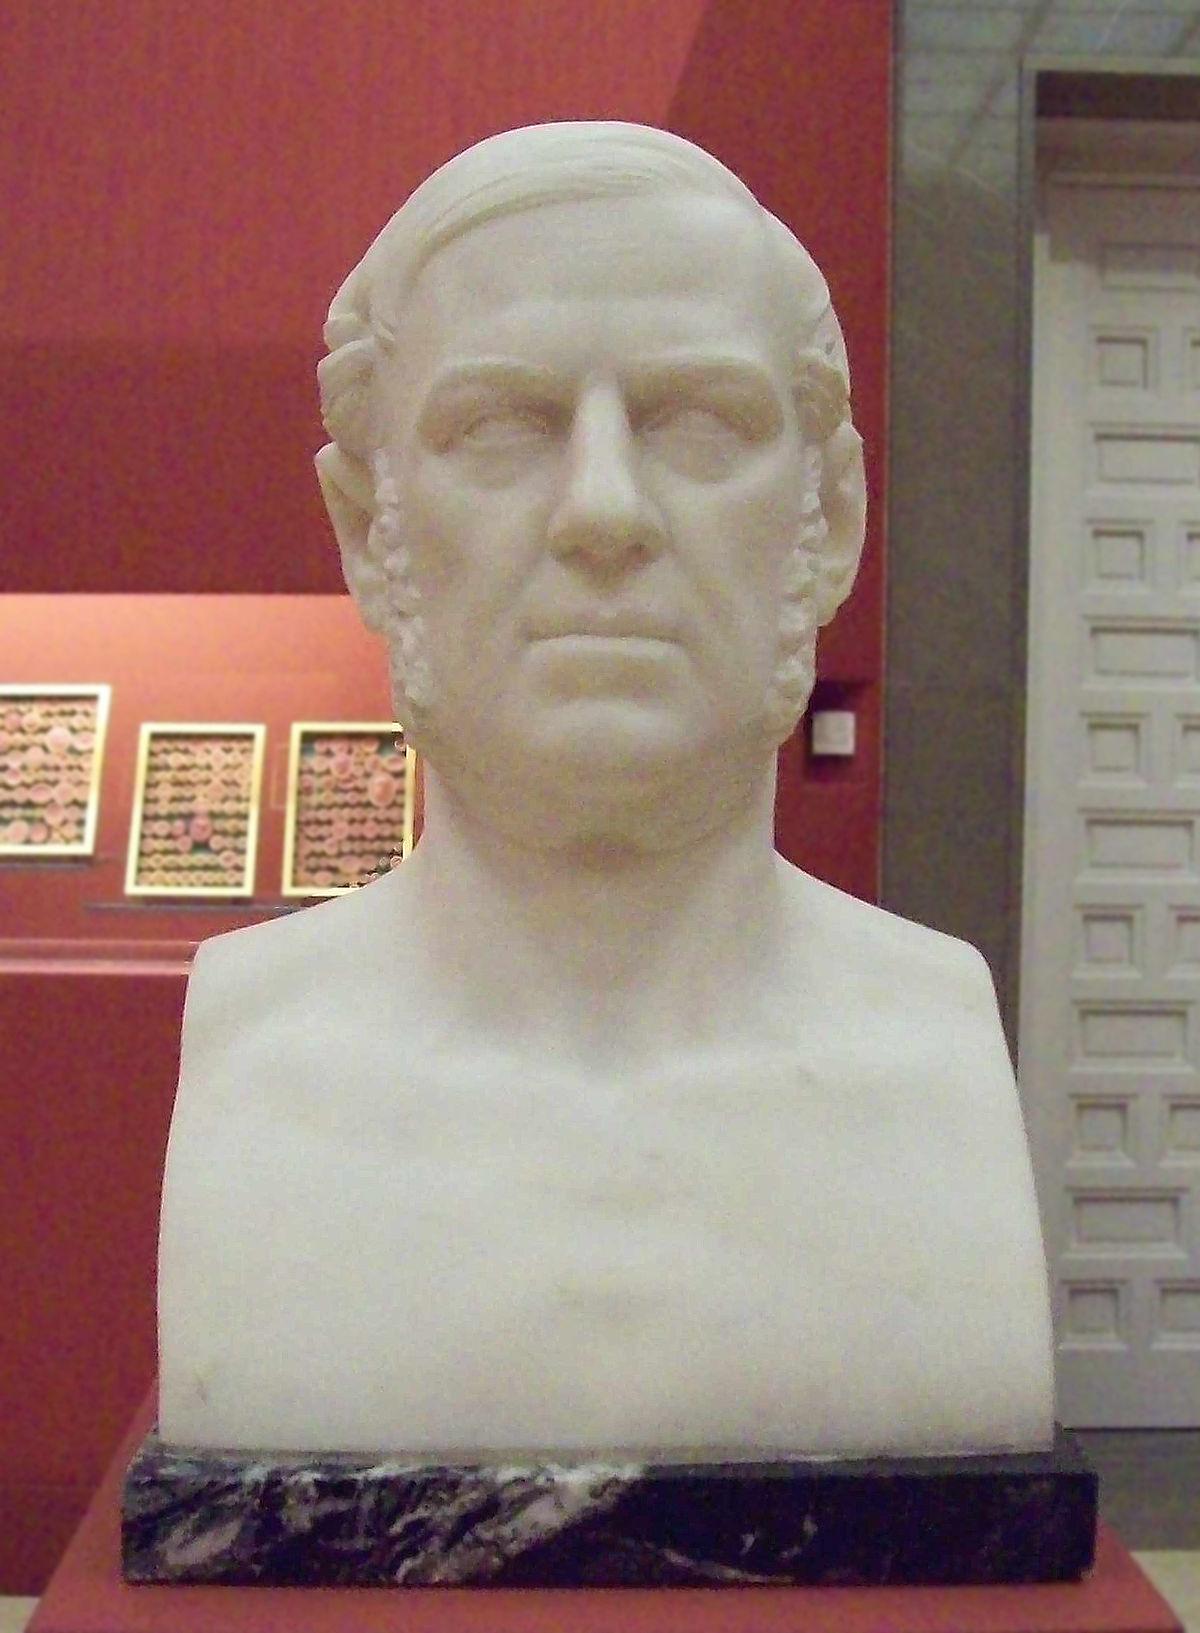 File Busto De Bernardo López José Piquer Mrabasf E 100 01 Jpg Wikimedia Commons